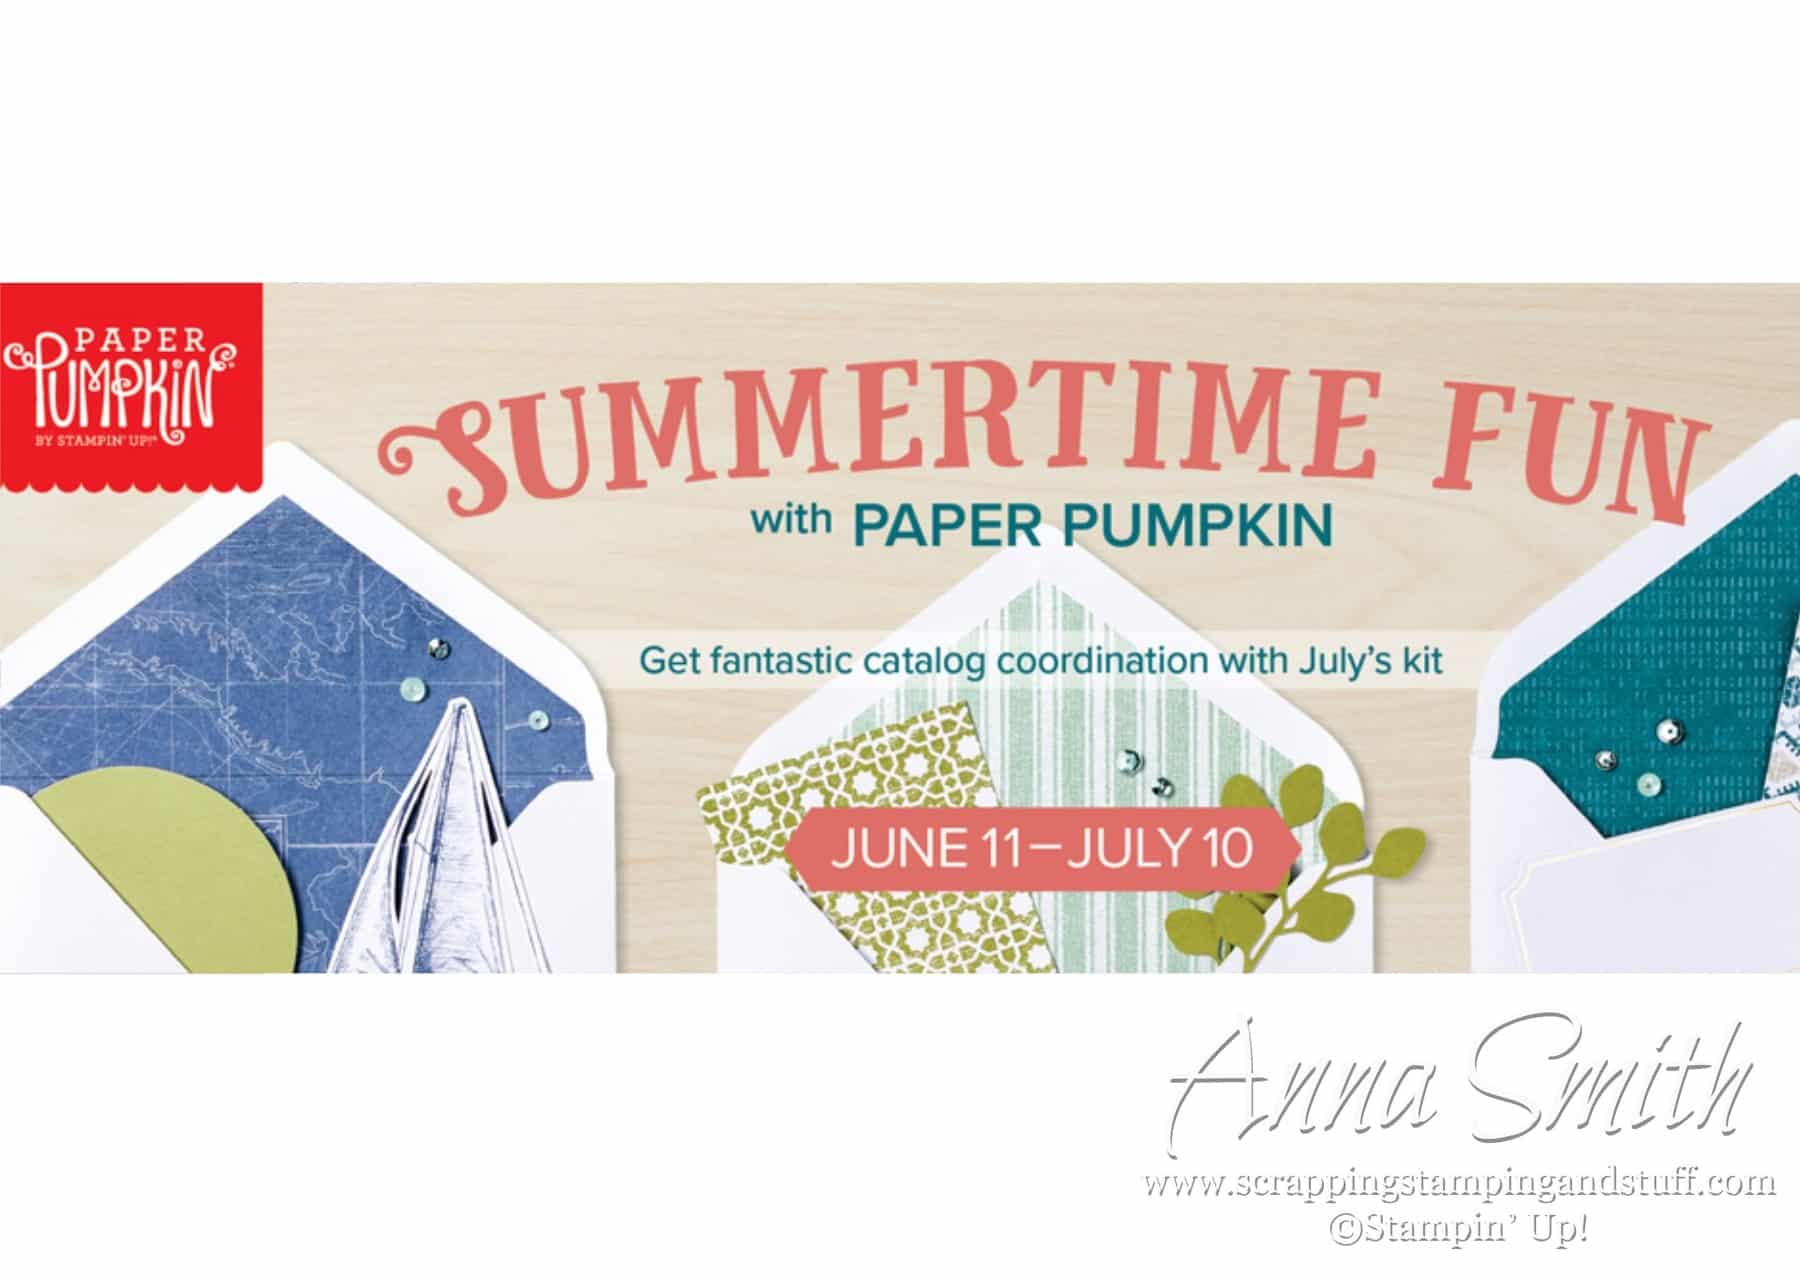 Sign up for July's Paper Pumpkin!